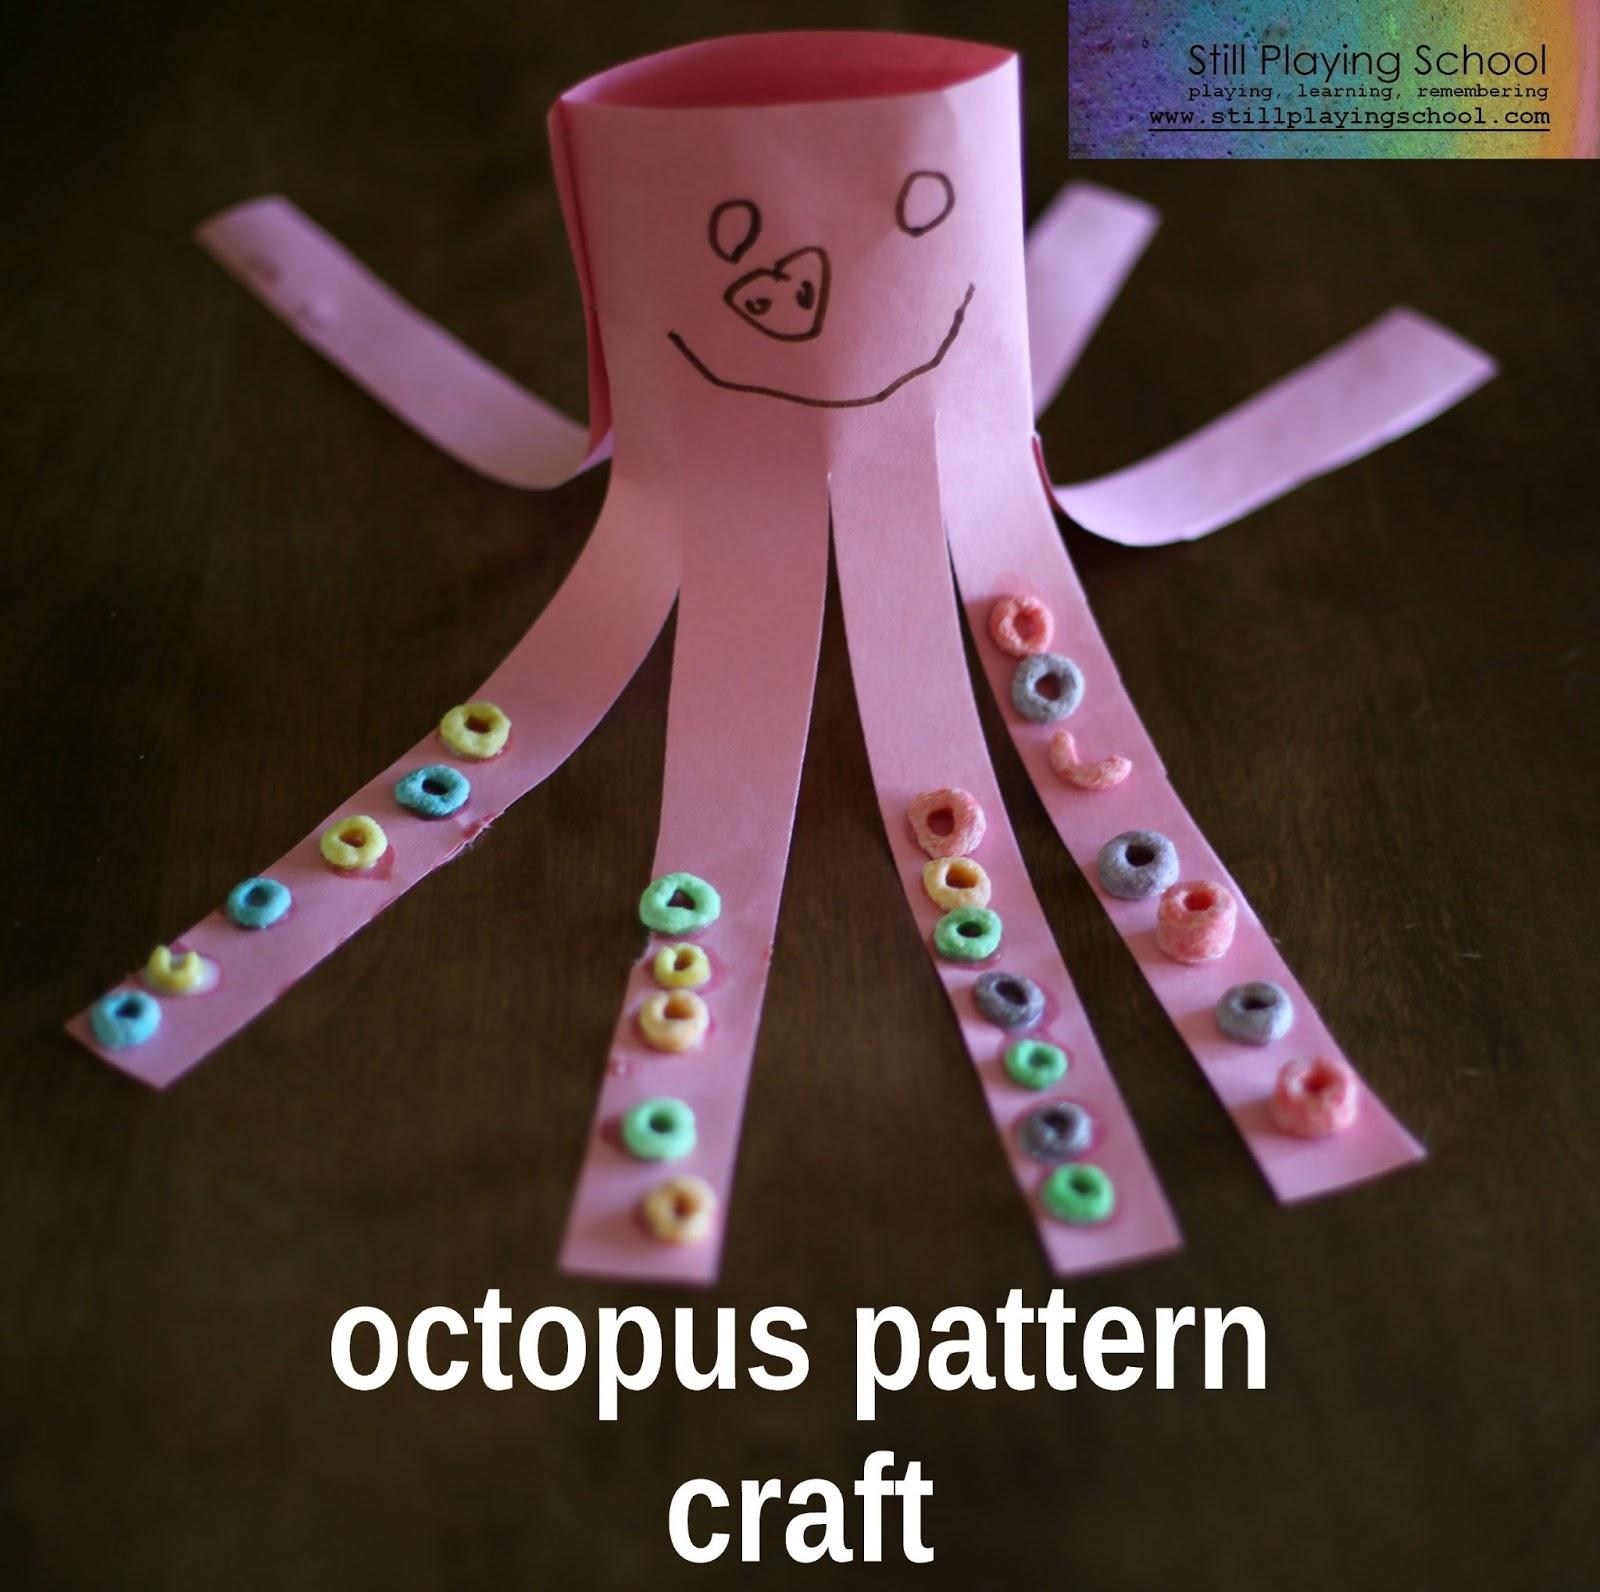 Octopus Pattern Craft